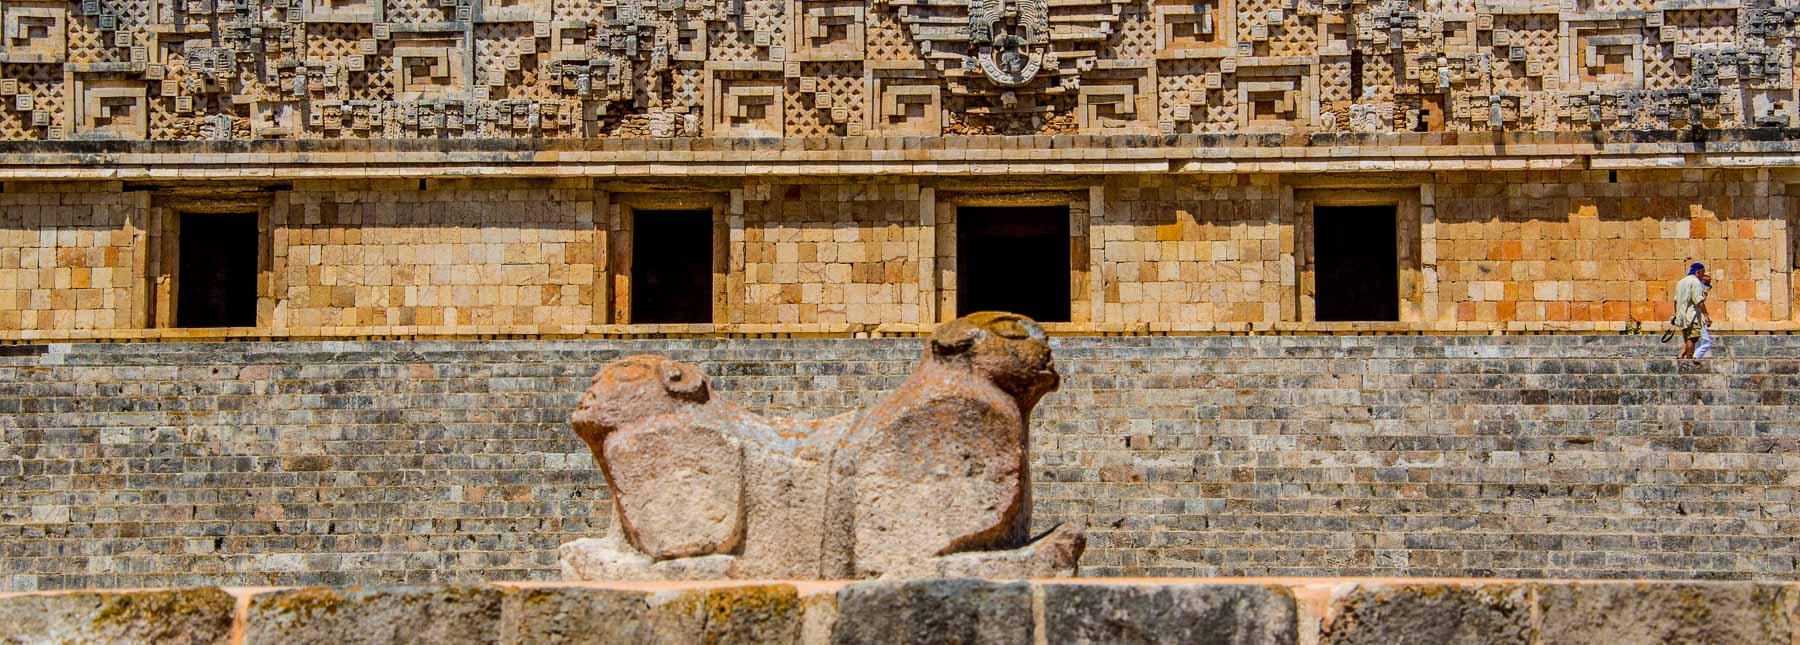 The Jaguar Throne at the Mayan ruin of Uxmal.